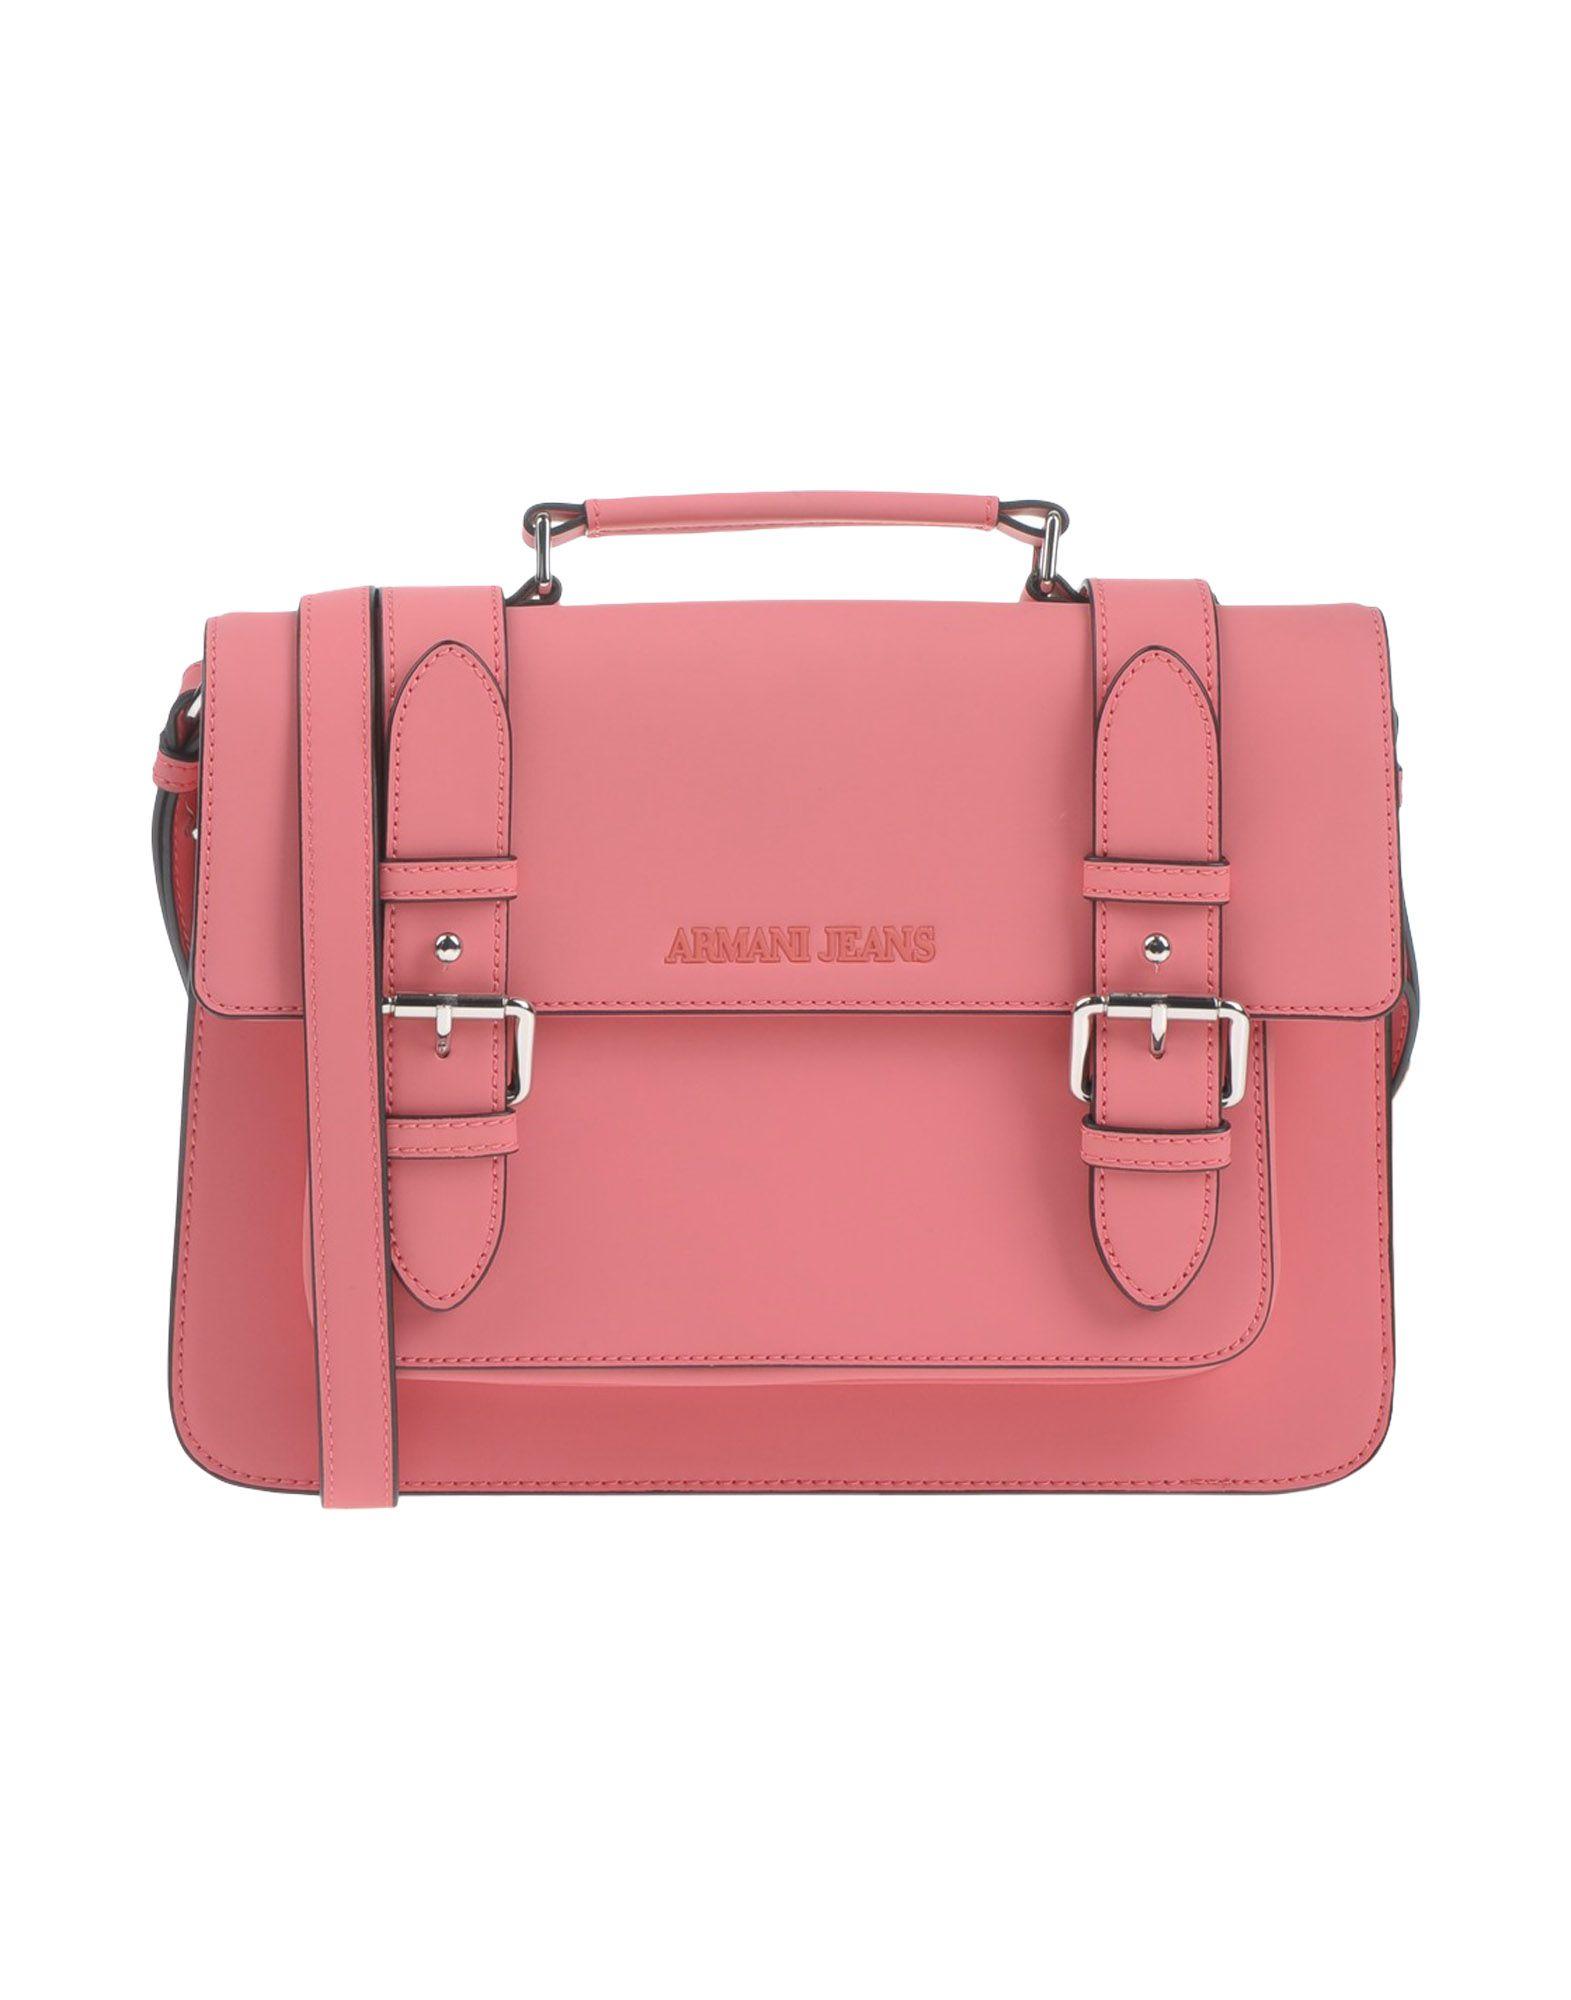 Armani Jeans Handbag - Women Armani Jeans Handbags online on YOOX United  Kingdom - 45385137KP 70eb7b1432d3c